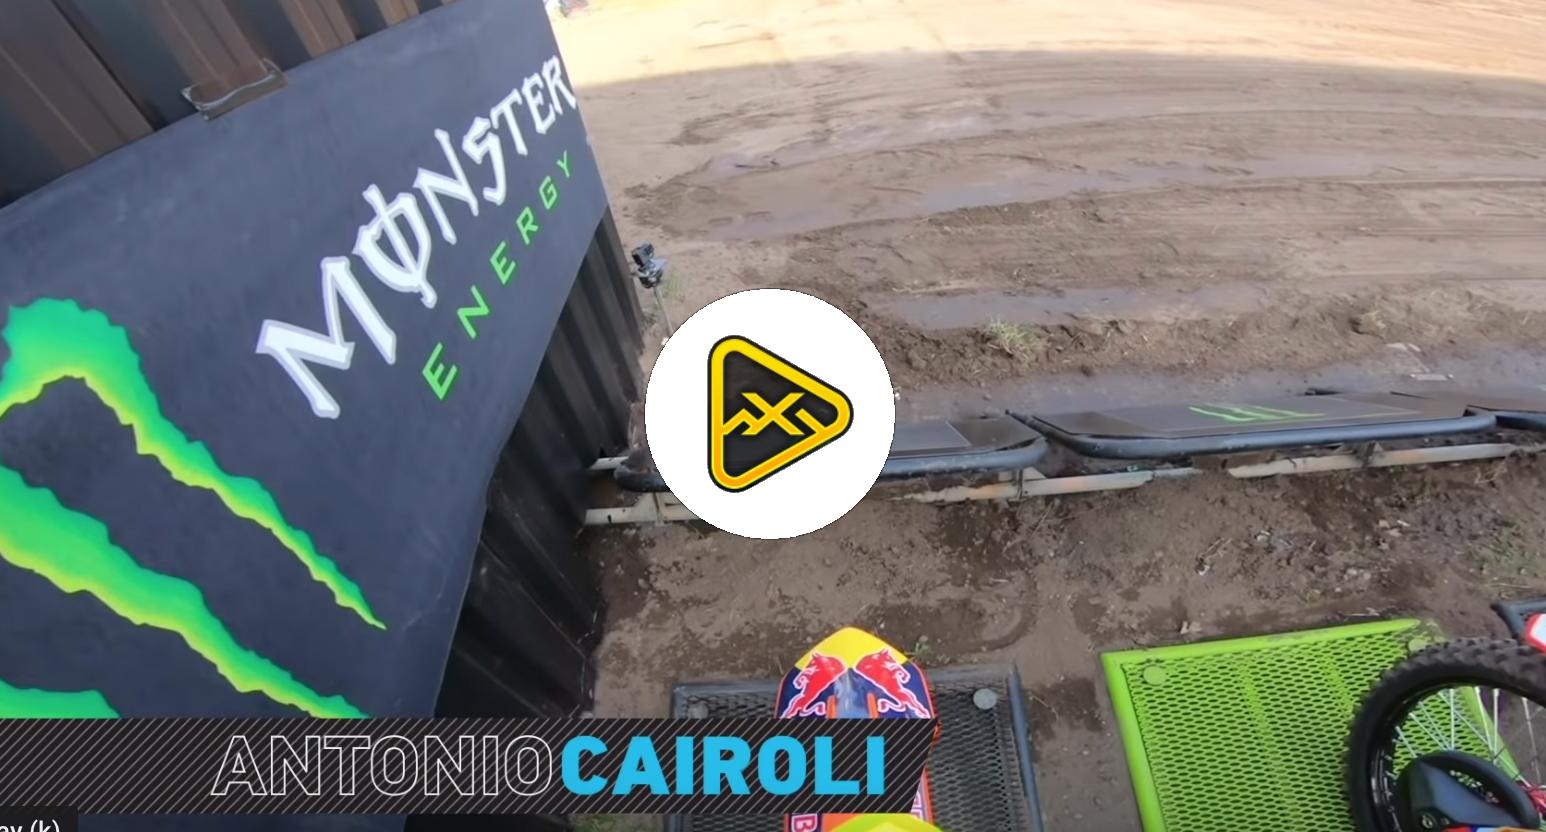 GoPro: Antonio Cairoli FIM MXGP 2019 RD3 Valkenswaard Qualifying